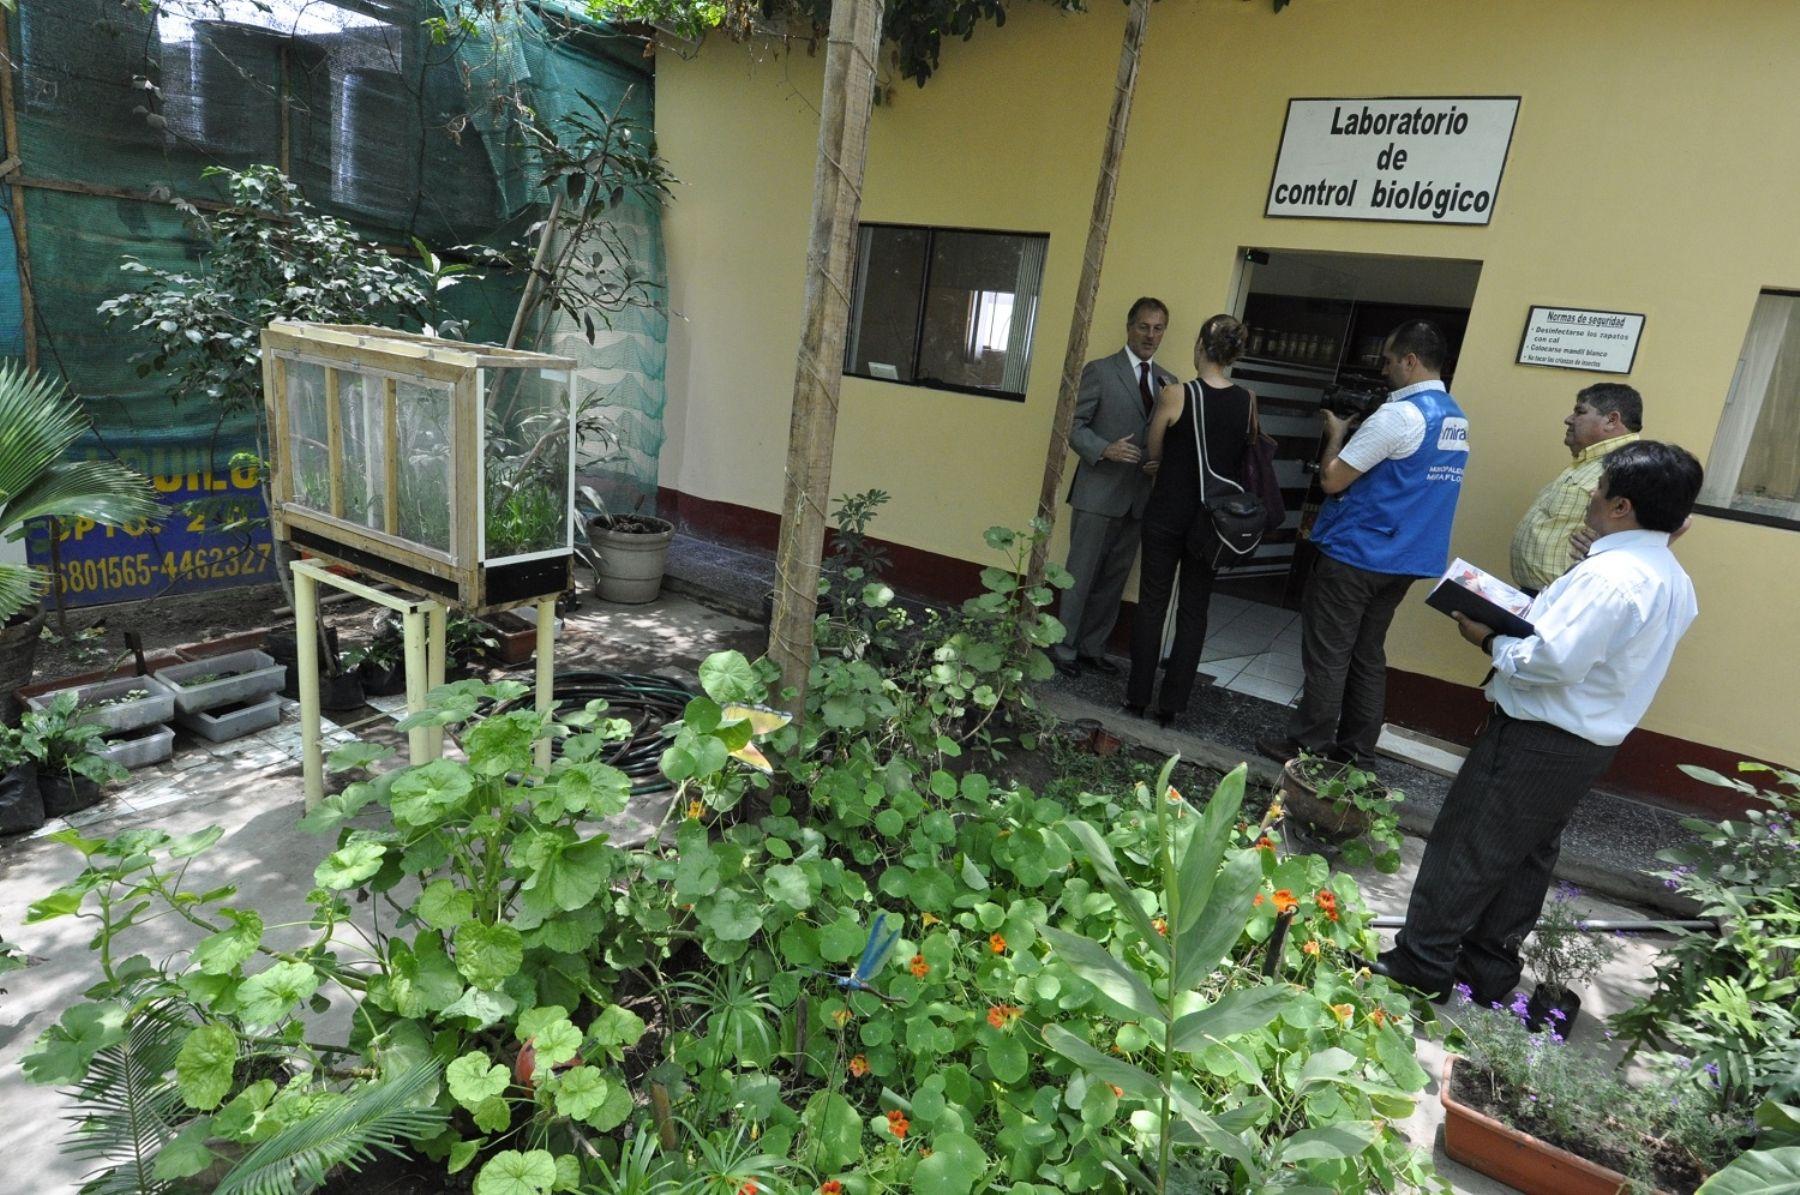 Jardines verticales son opci n ecol gica y saludable para for Jardines verticales lima